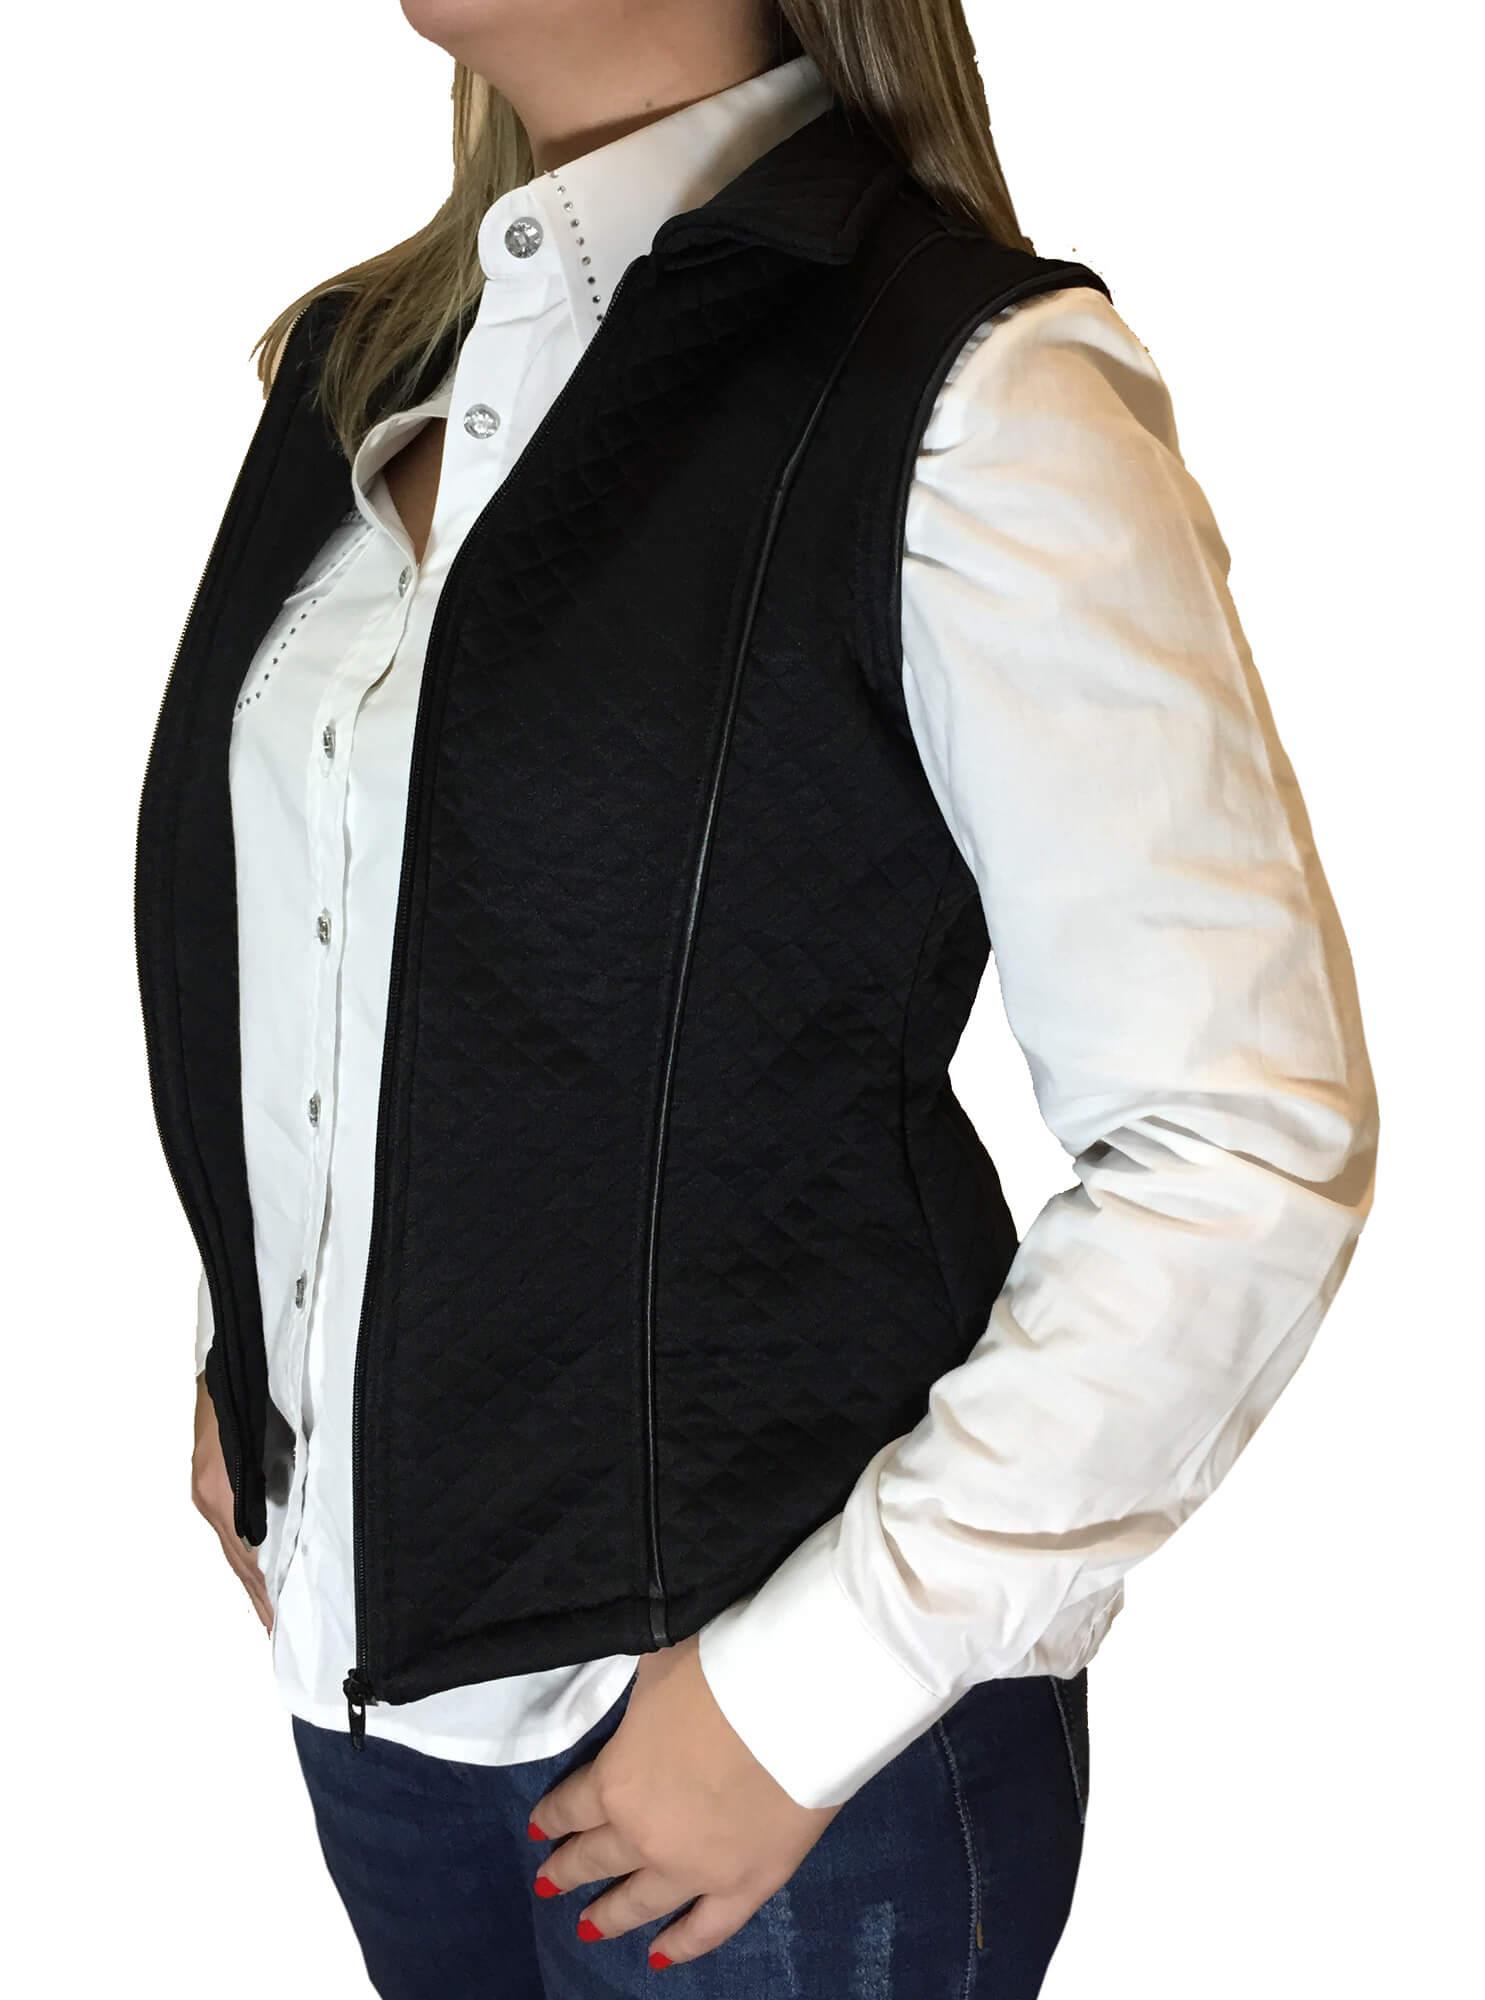 Colete Feminino Minuty Jeans Metalace Ref. 297